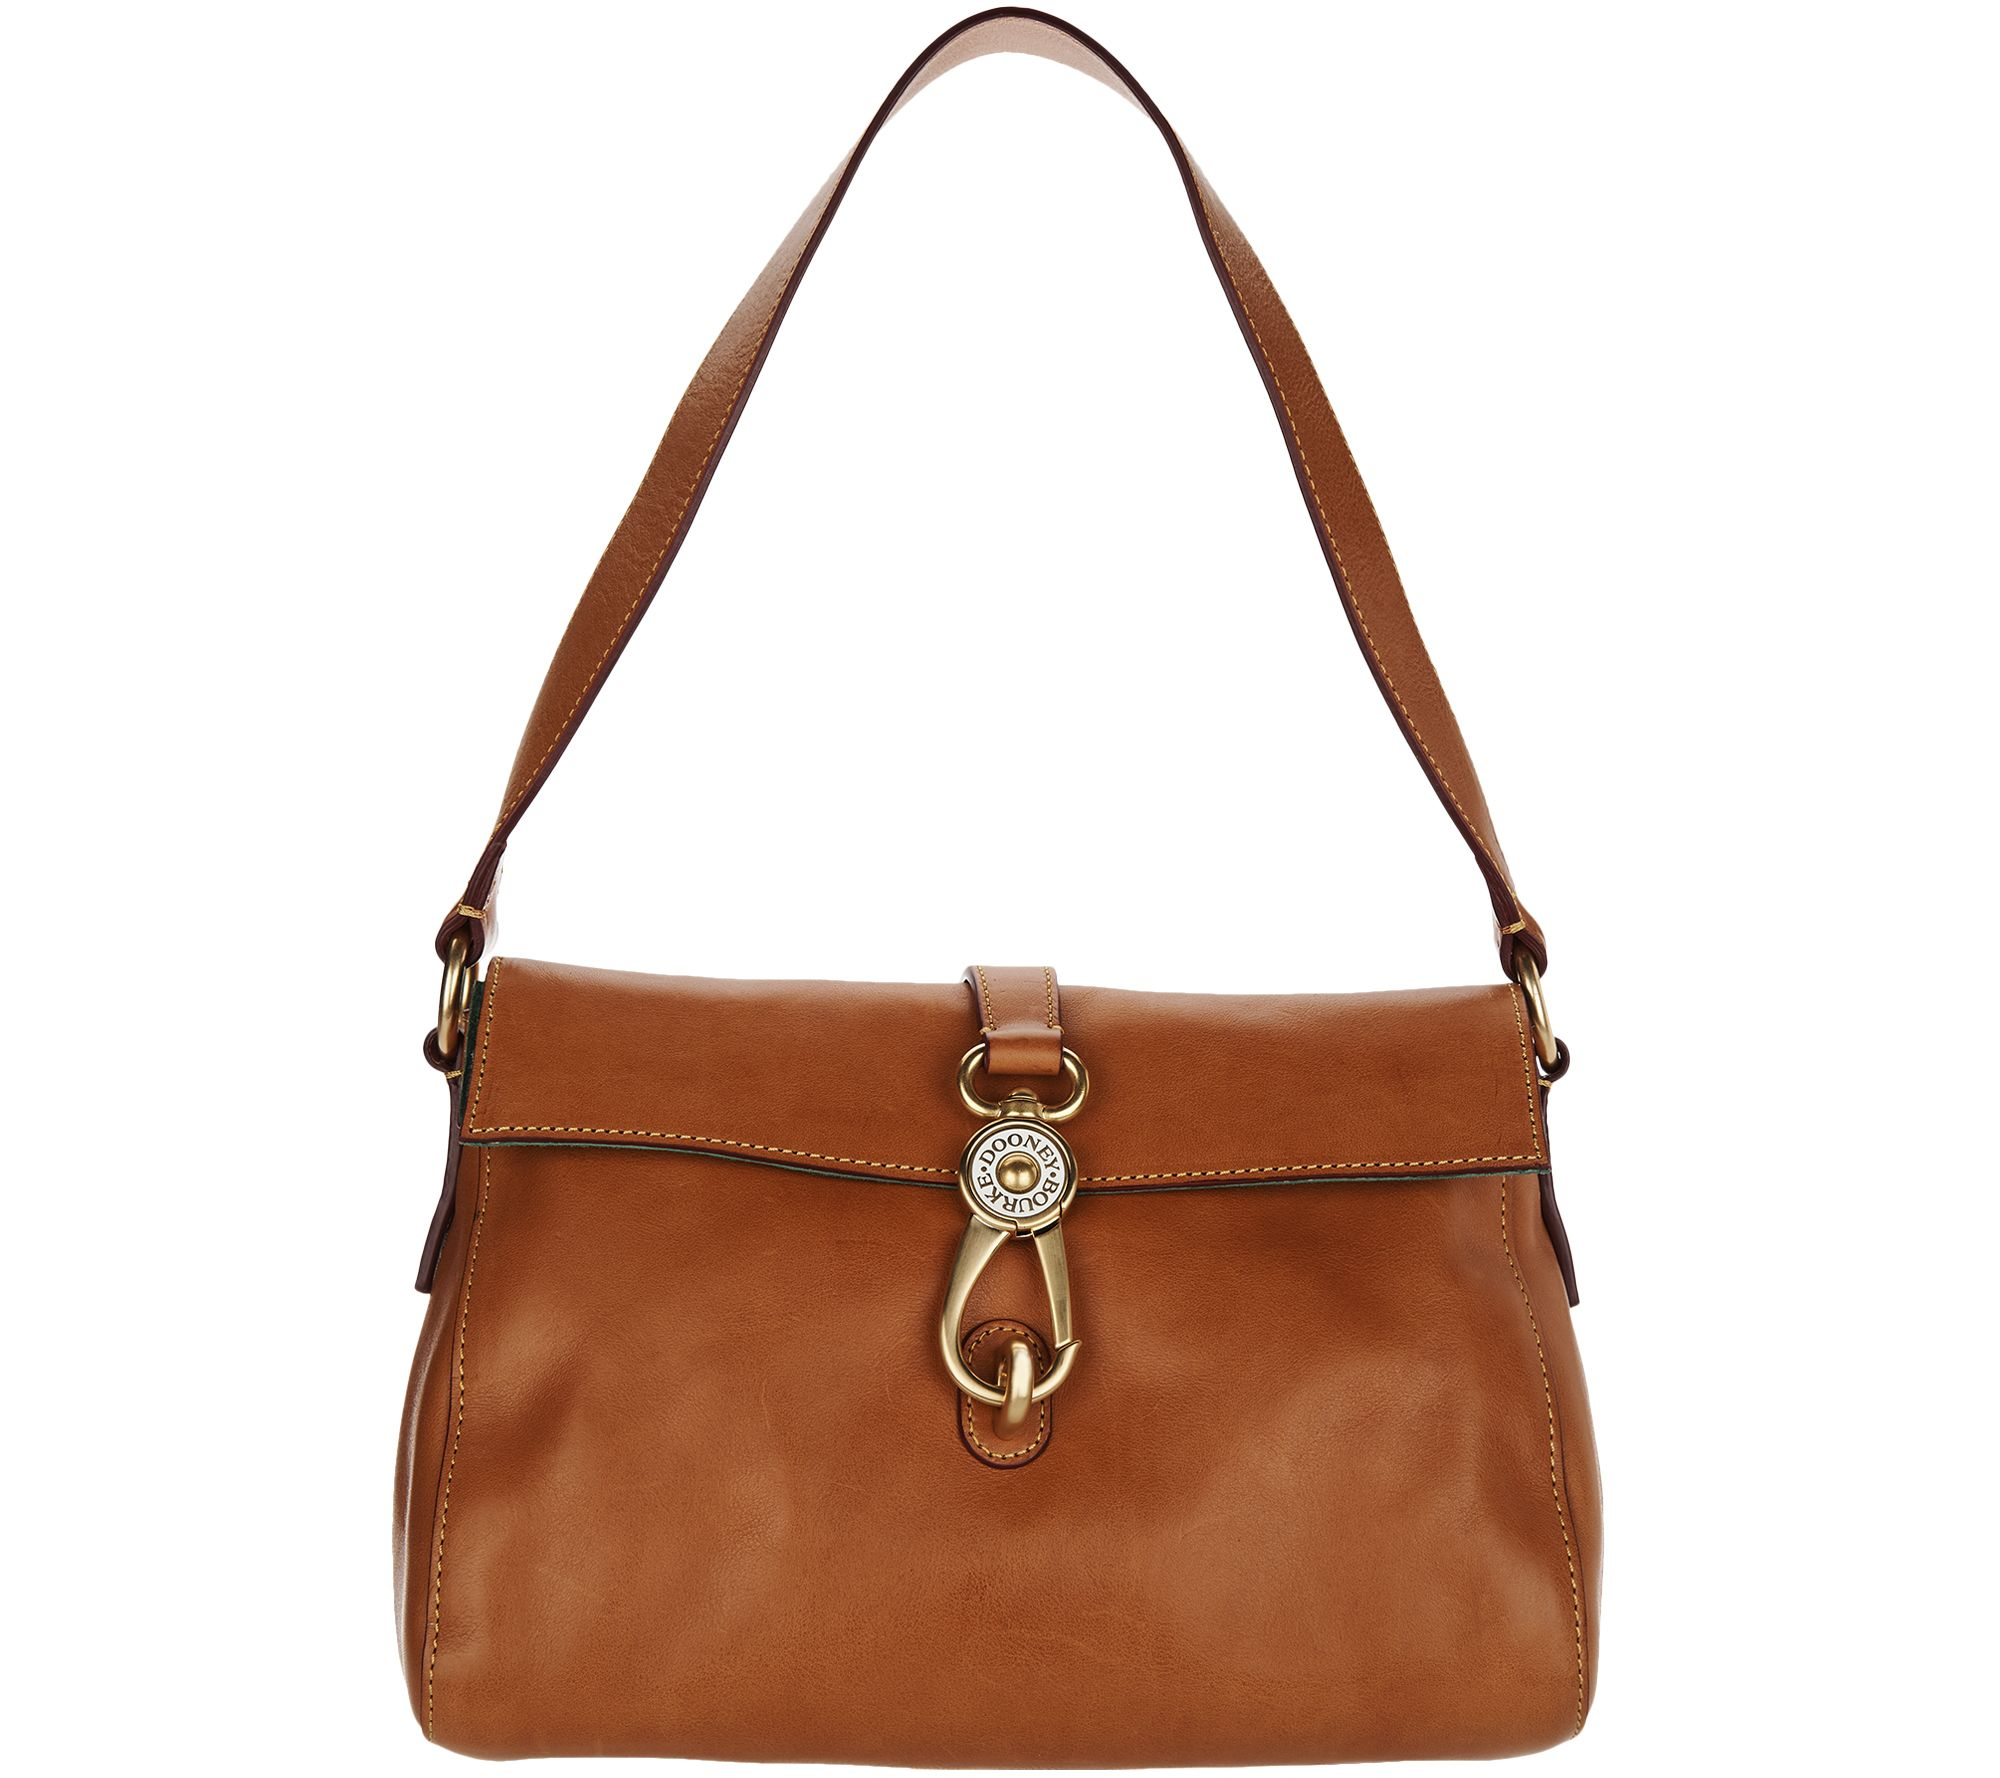 bc851519c0 Dooney   Bourke Florentine Hobo Handbag -Libby - Page 1 — QVC.com